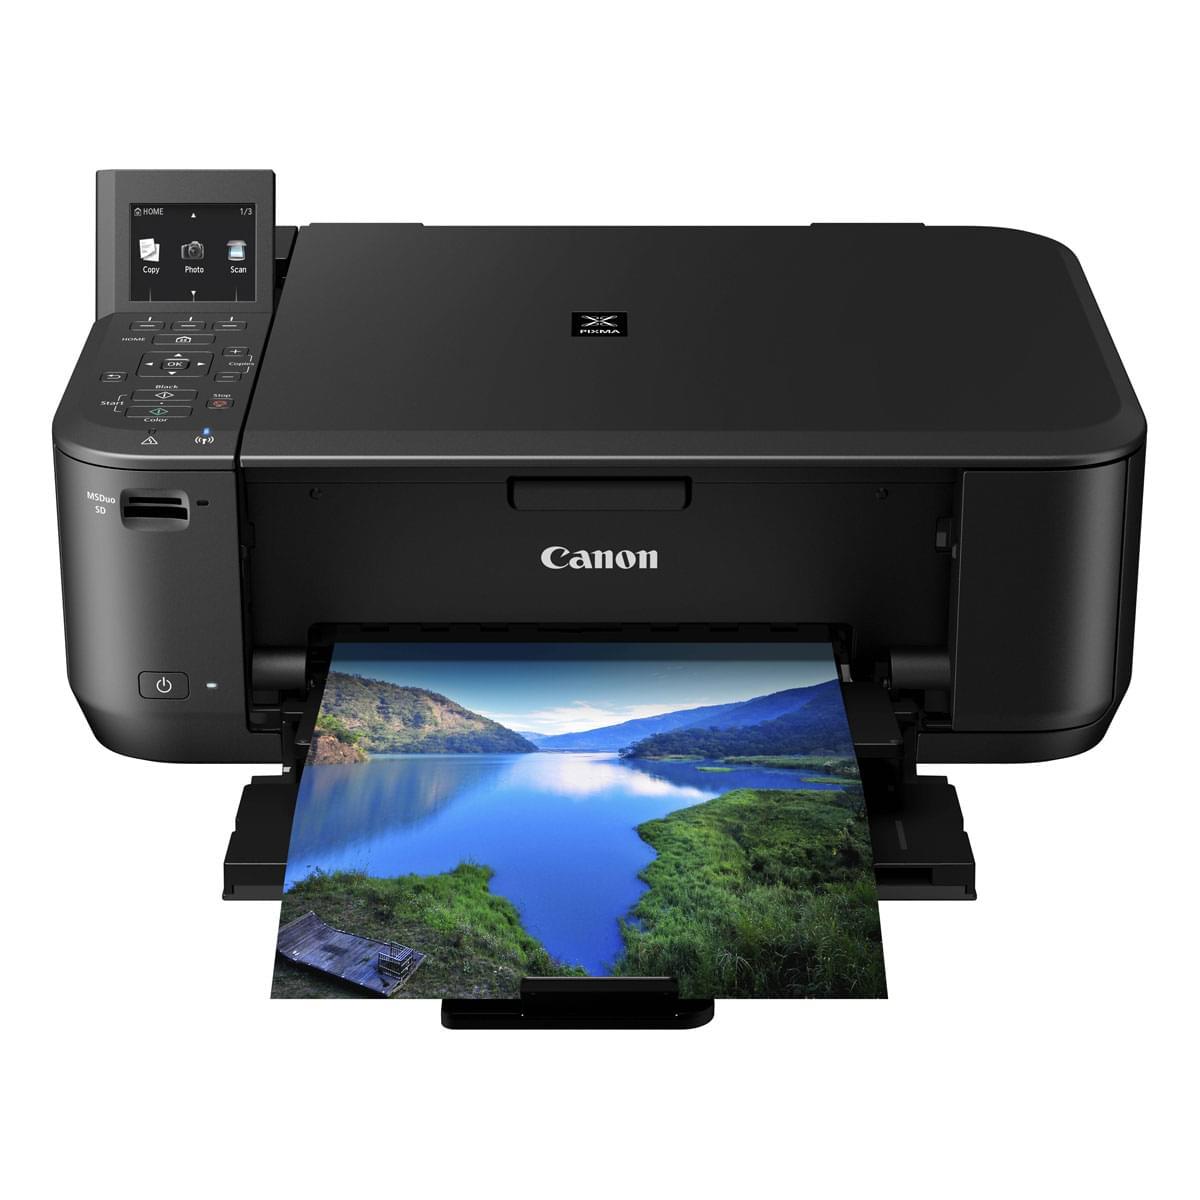 Canon PIXMA MG4250 (Recto-Verso/ WI-FI) (6224B006AA) - Achat / Vente Imprimante Multifonction sur Cybertek.fr - 0